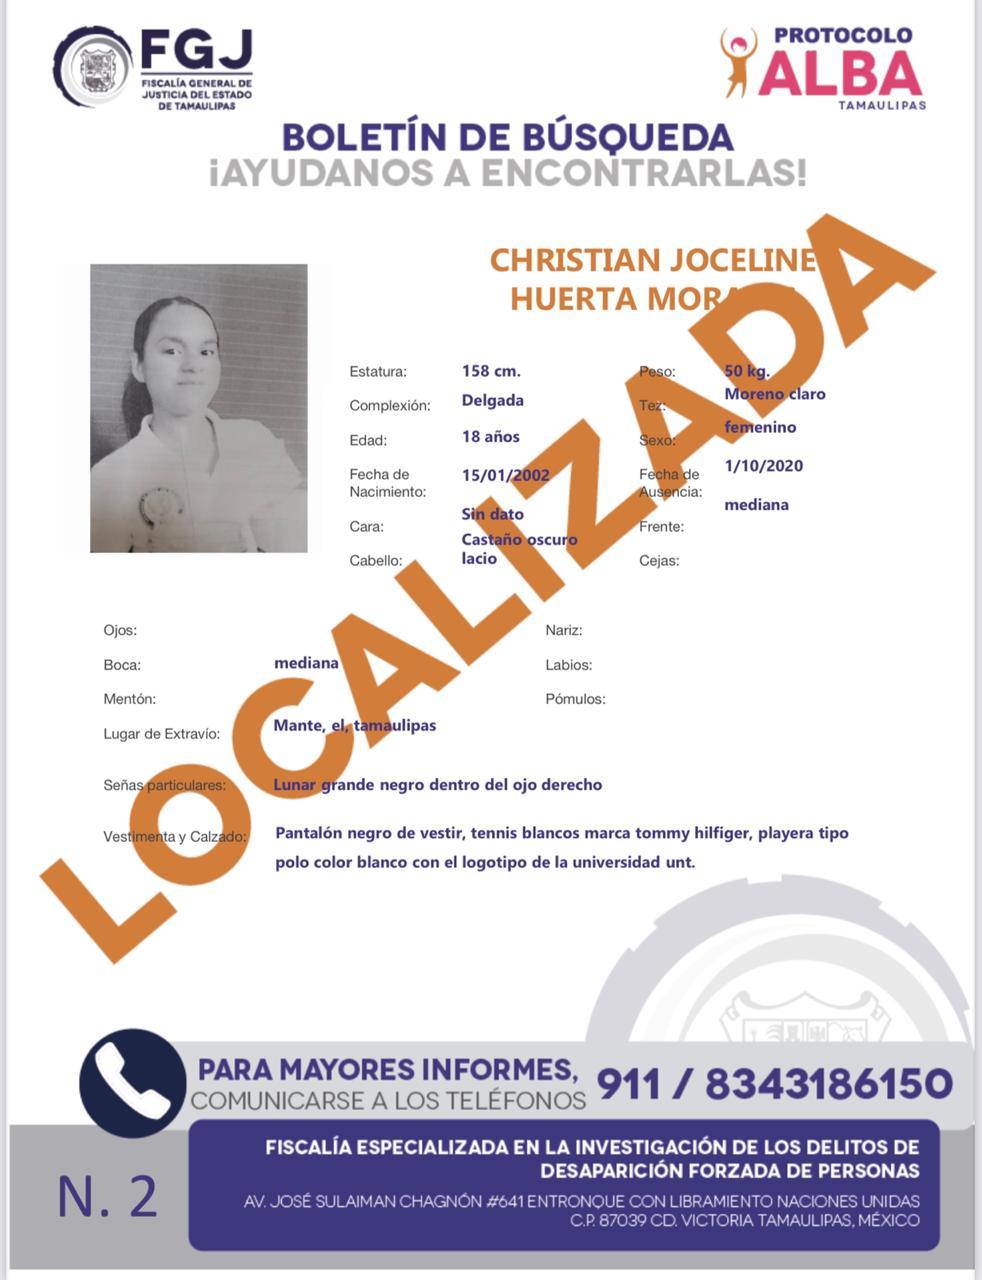 Christian-Joceline-Huerta-Morales-localizada